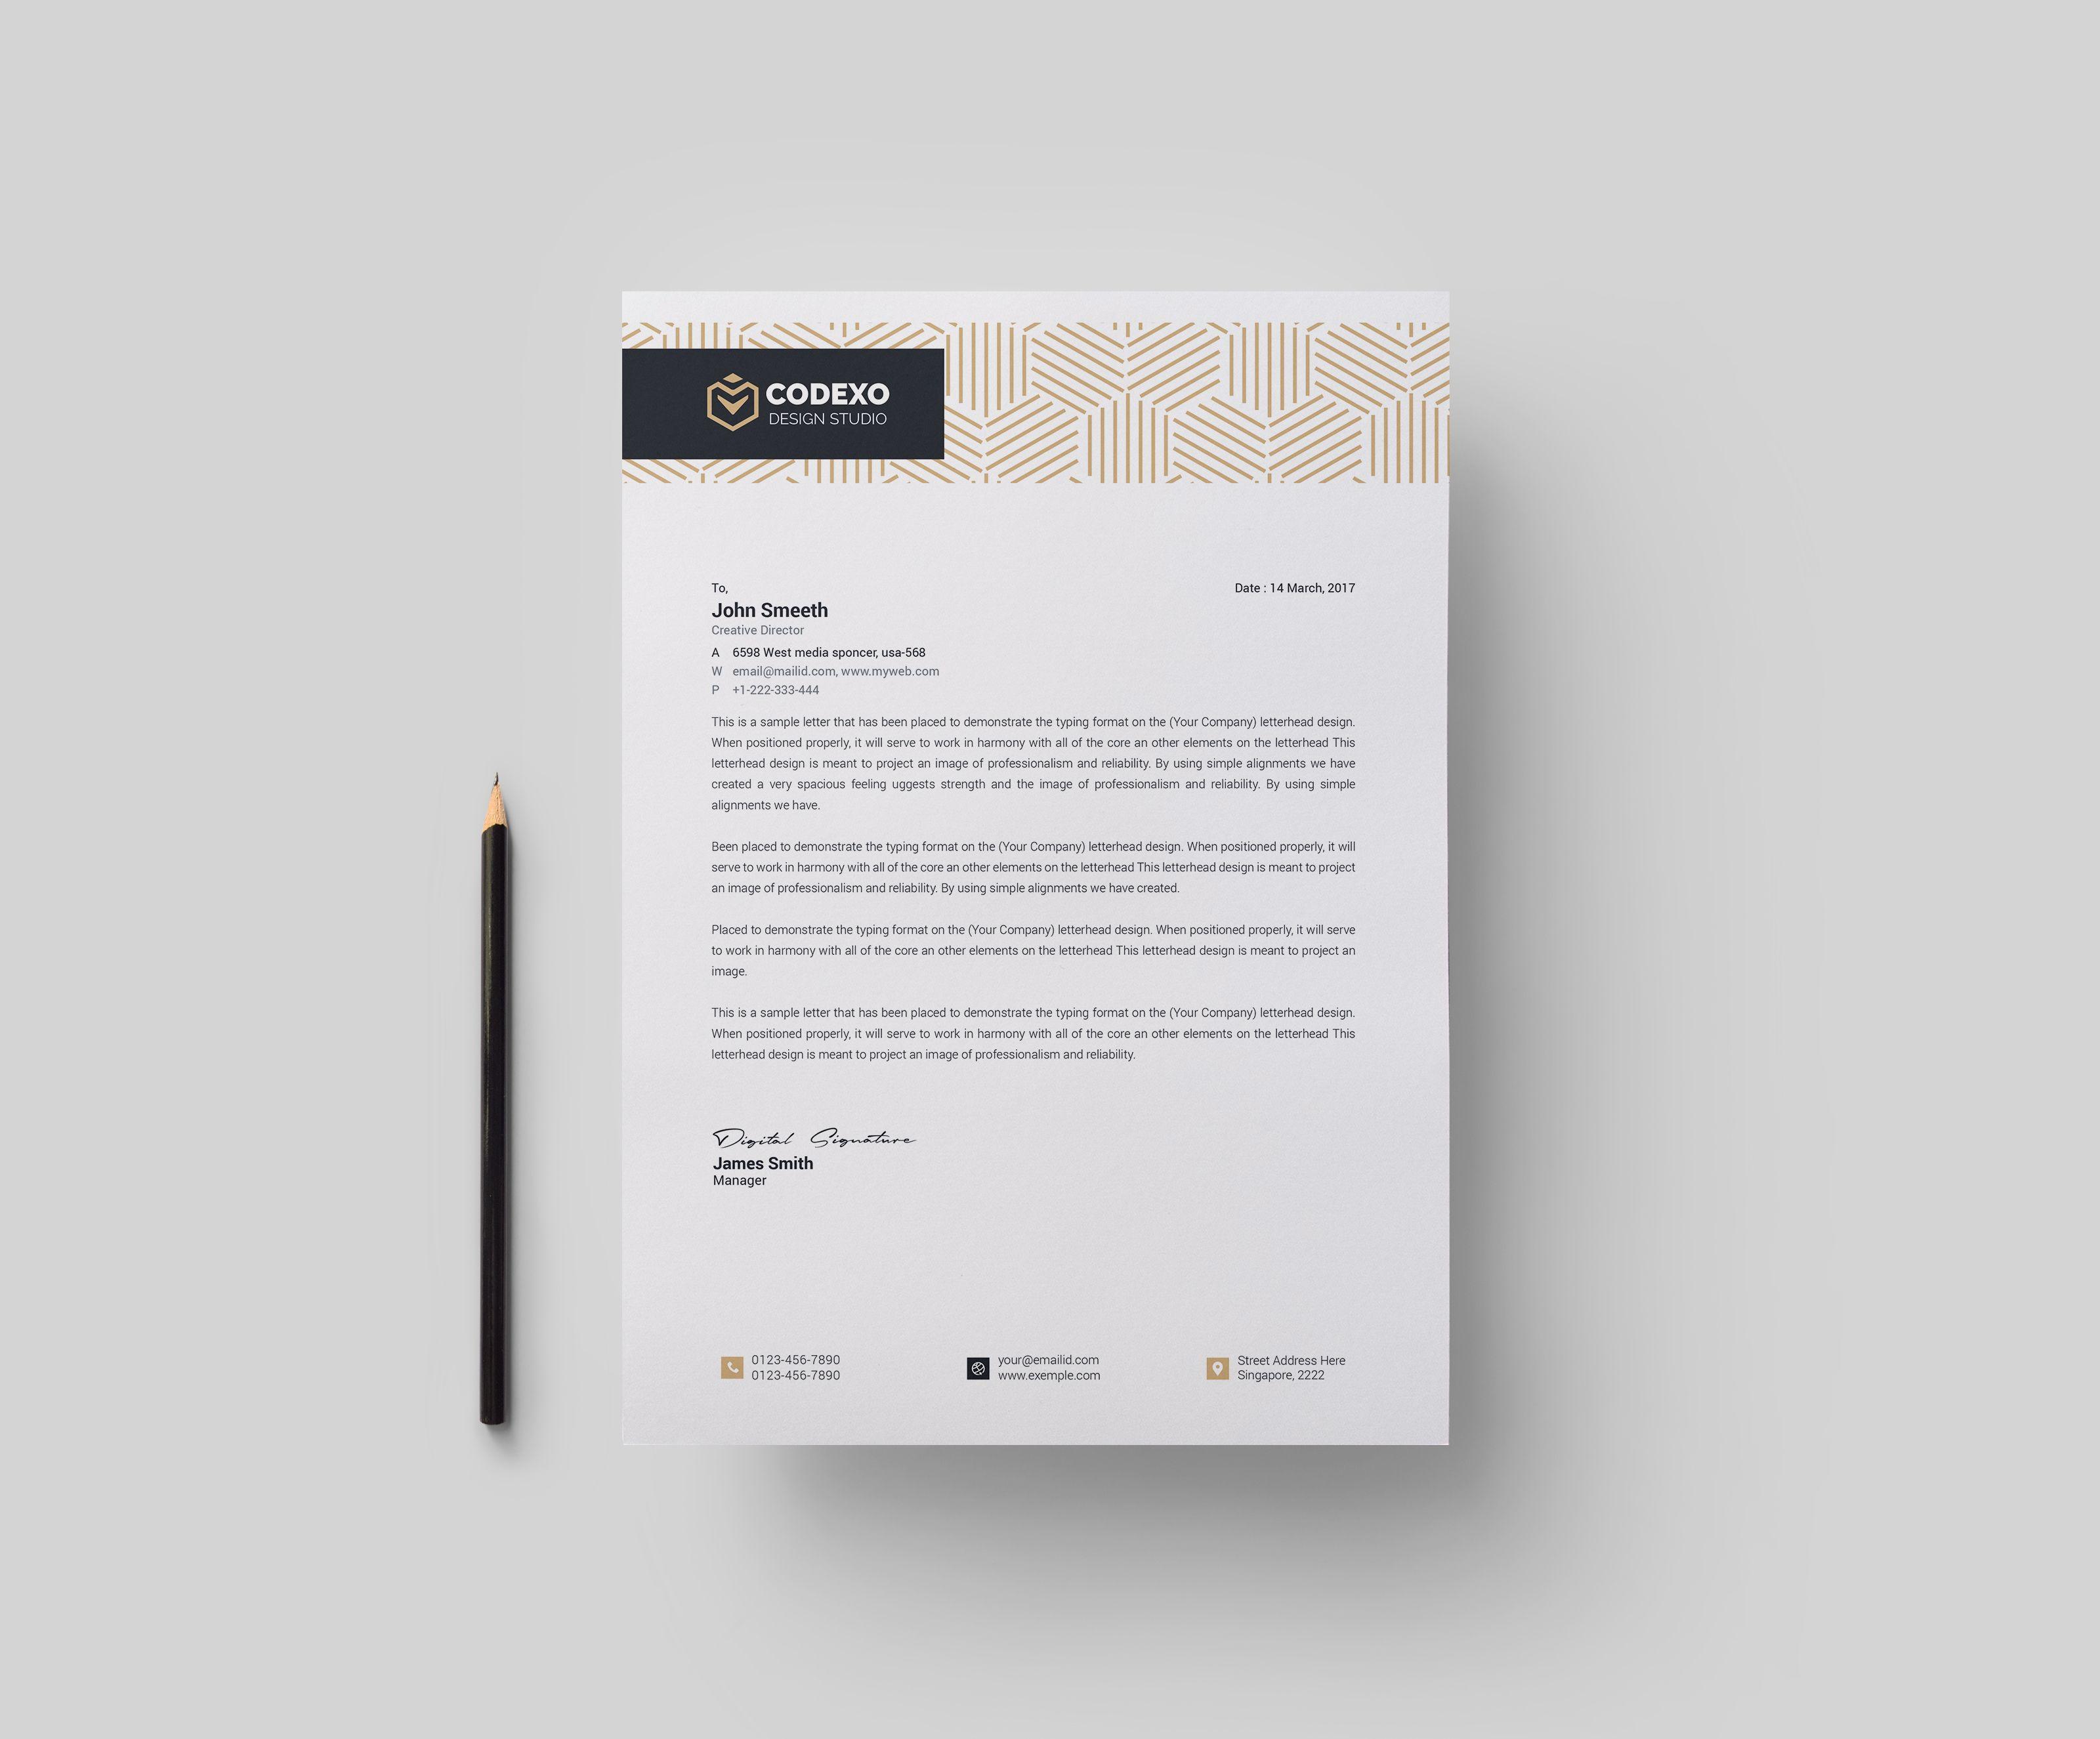 Demeter Stylish Corporate Letterhead Template Letterhead Design Inspiration Letterhead Template Letterhead Design